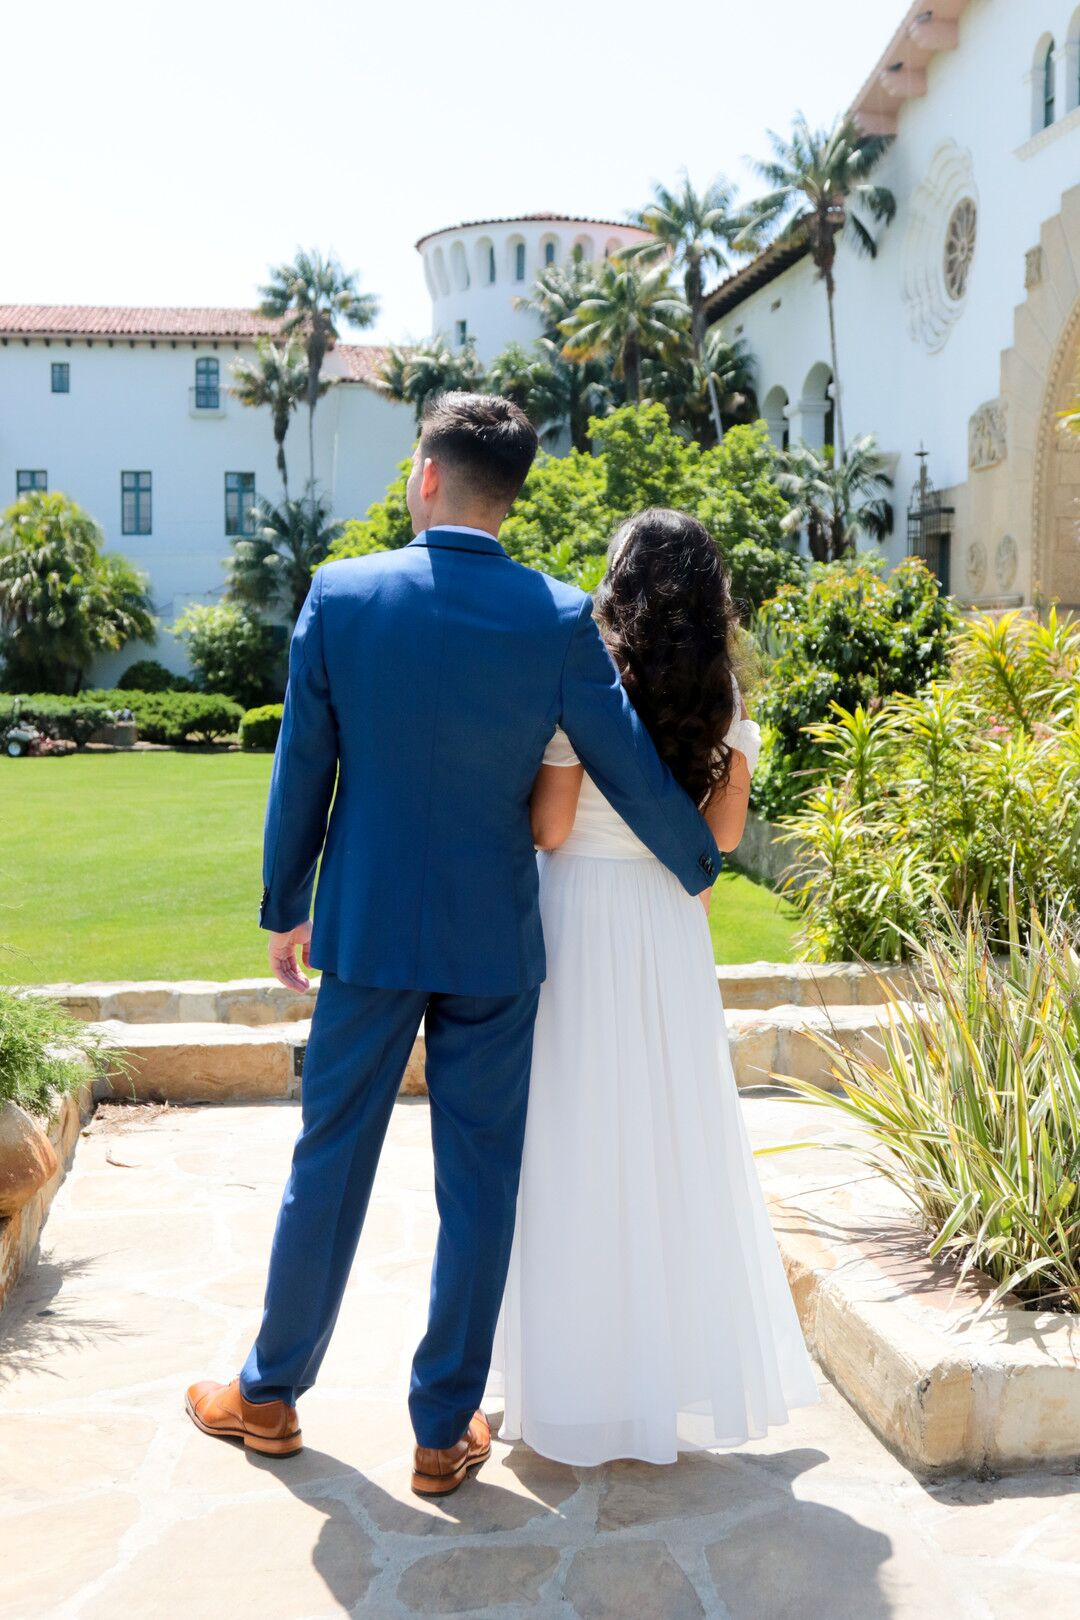 www.santabarbaraweddings.com | Photographer: Trista Maja Photography | Venue: Santa Barbara Courthouse | Wedding Dress: Lulus | Hair: Legends Hair |  Bride and Groom Embrace